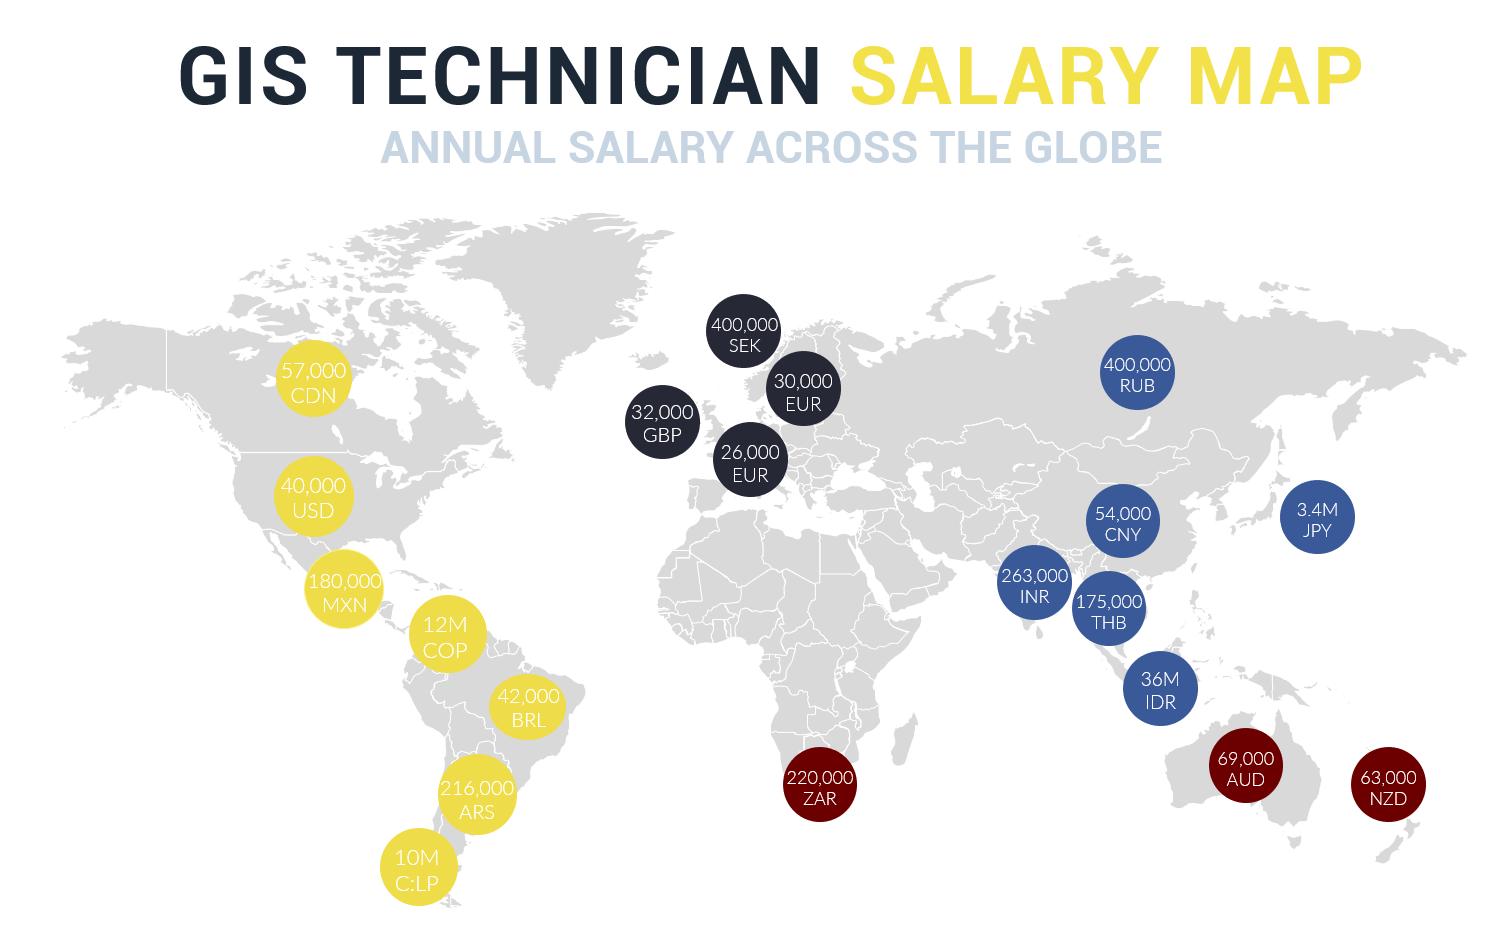 GIS Technician Salary Map